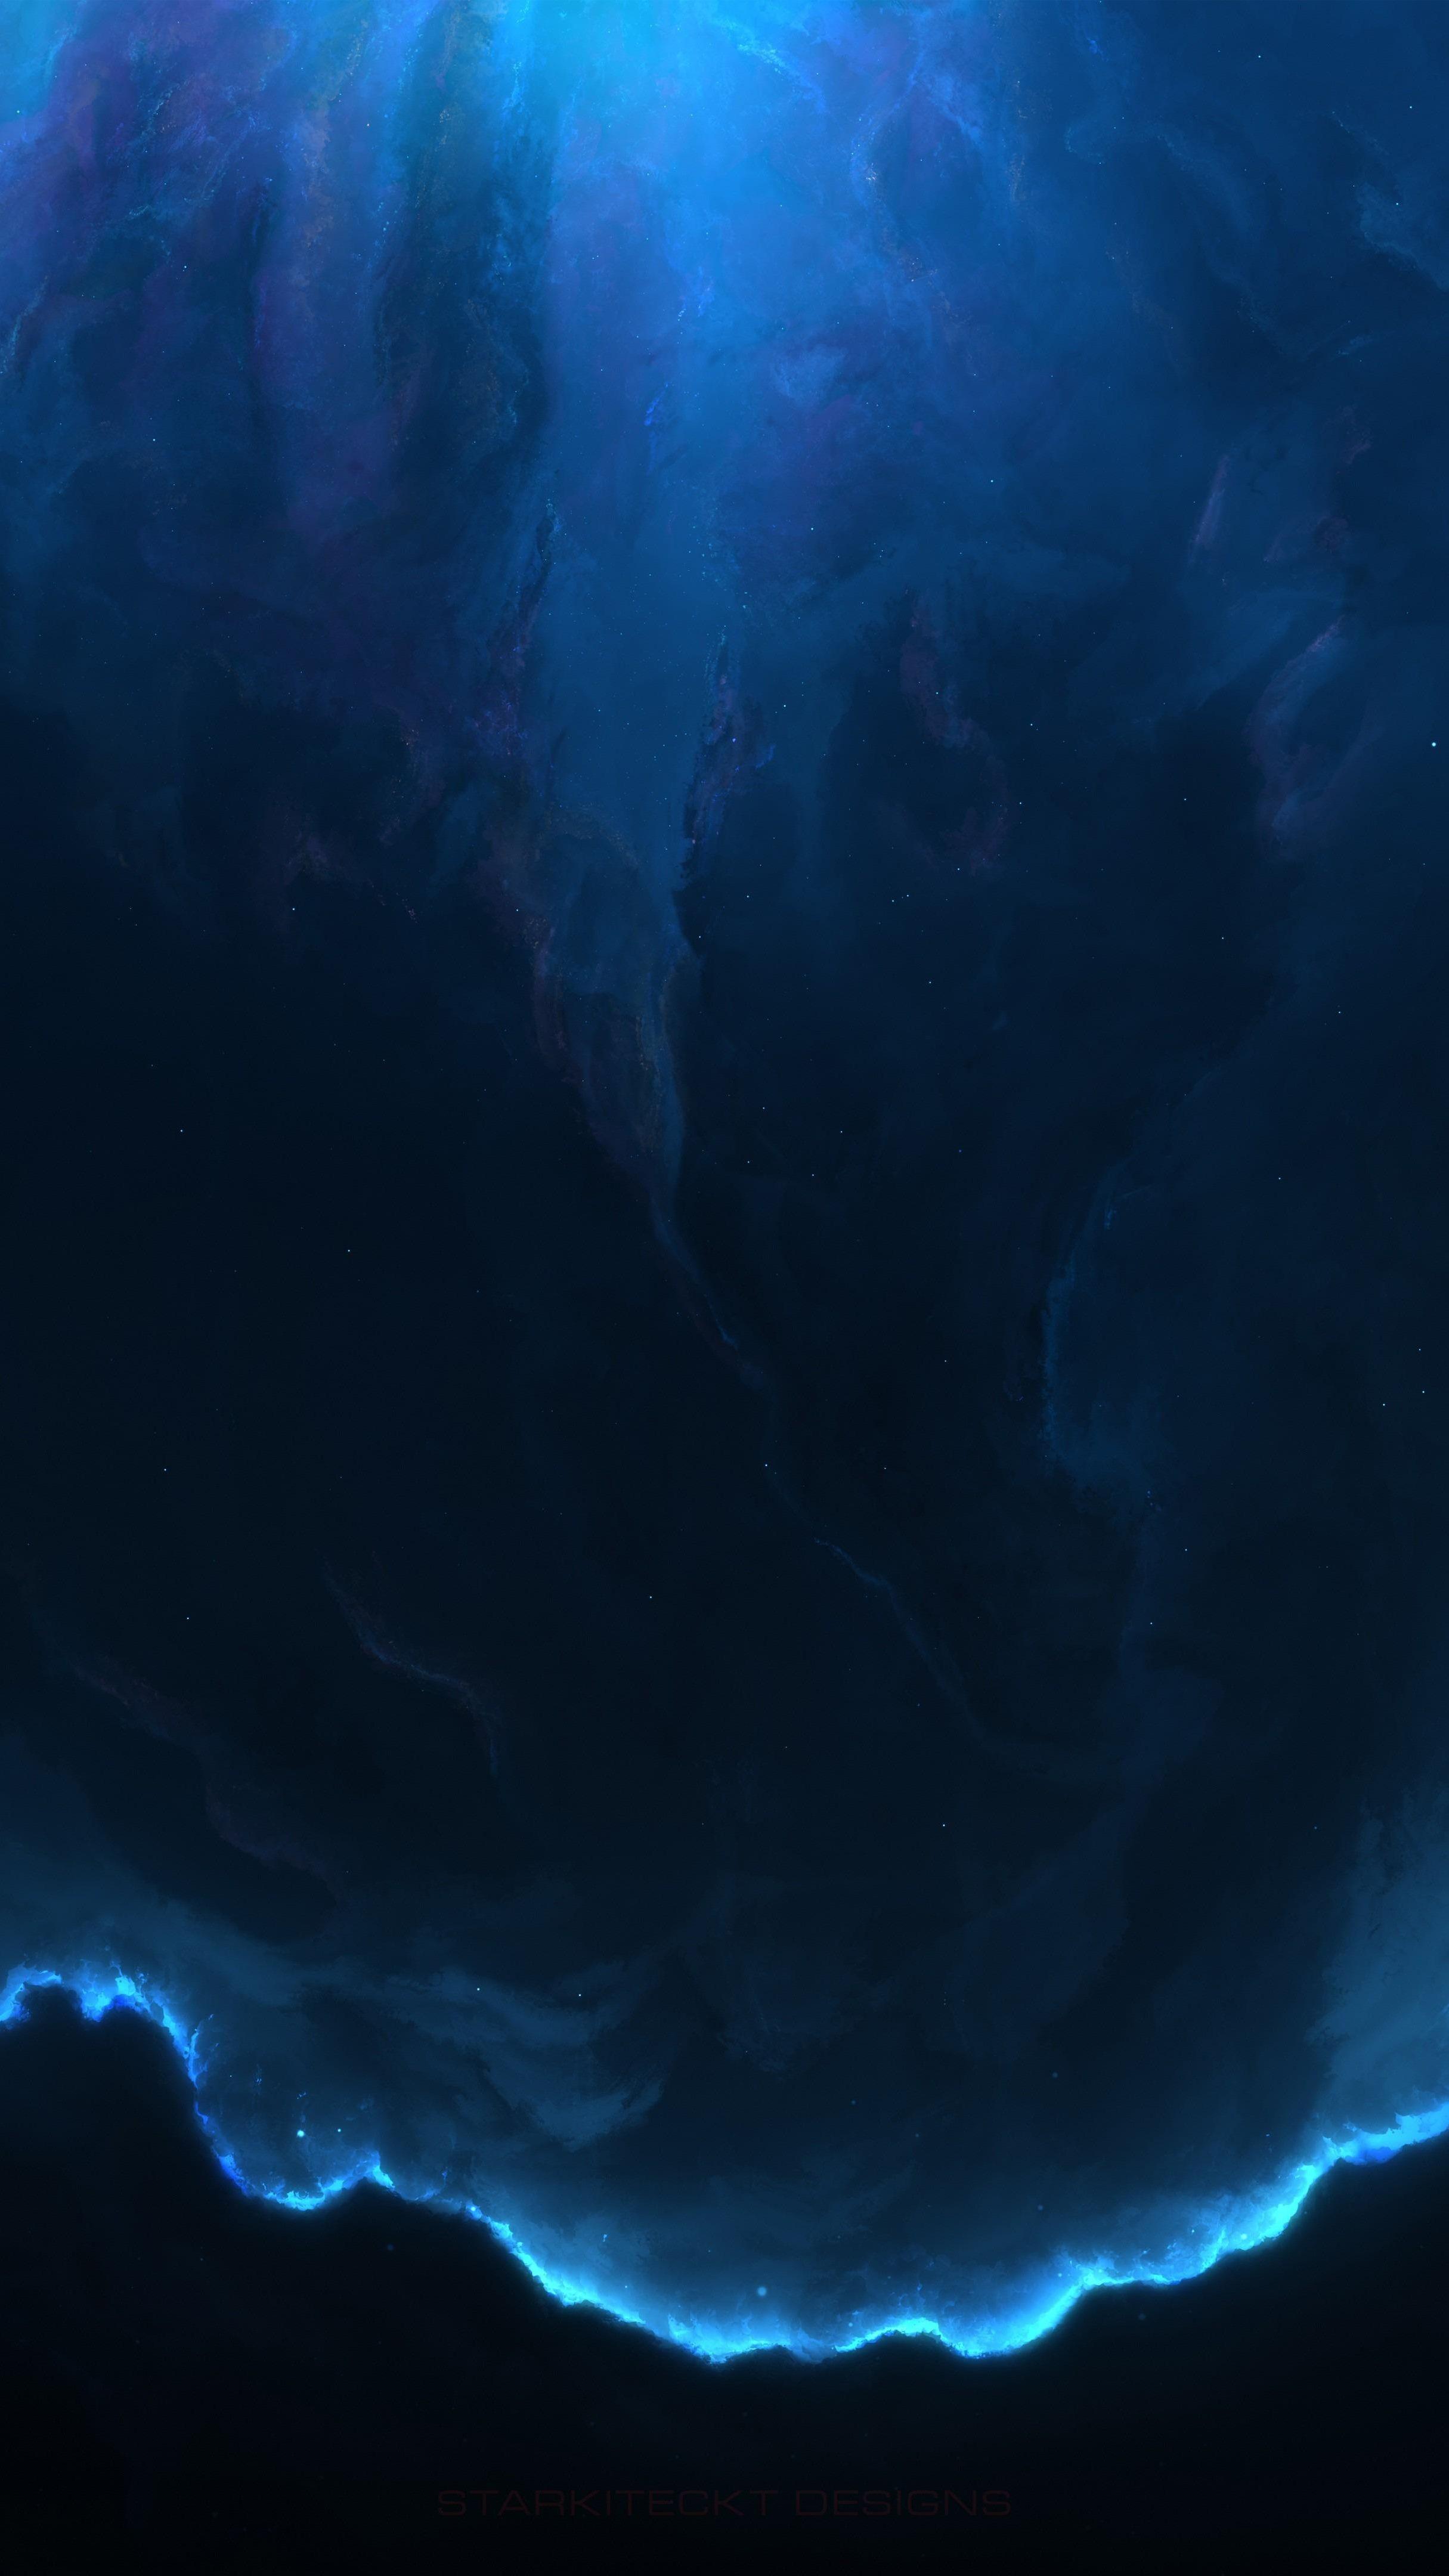 8K UHD Blue universe wallpaper - backiee